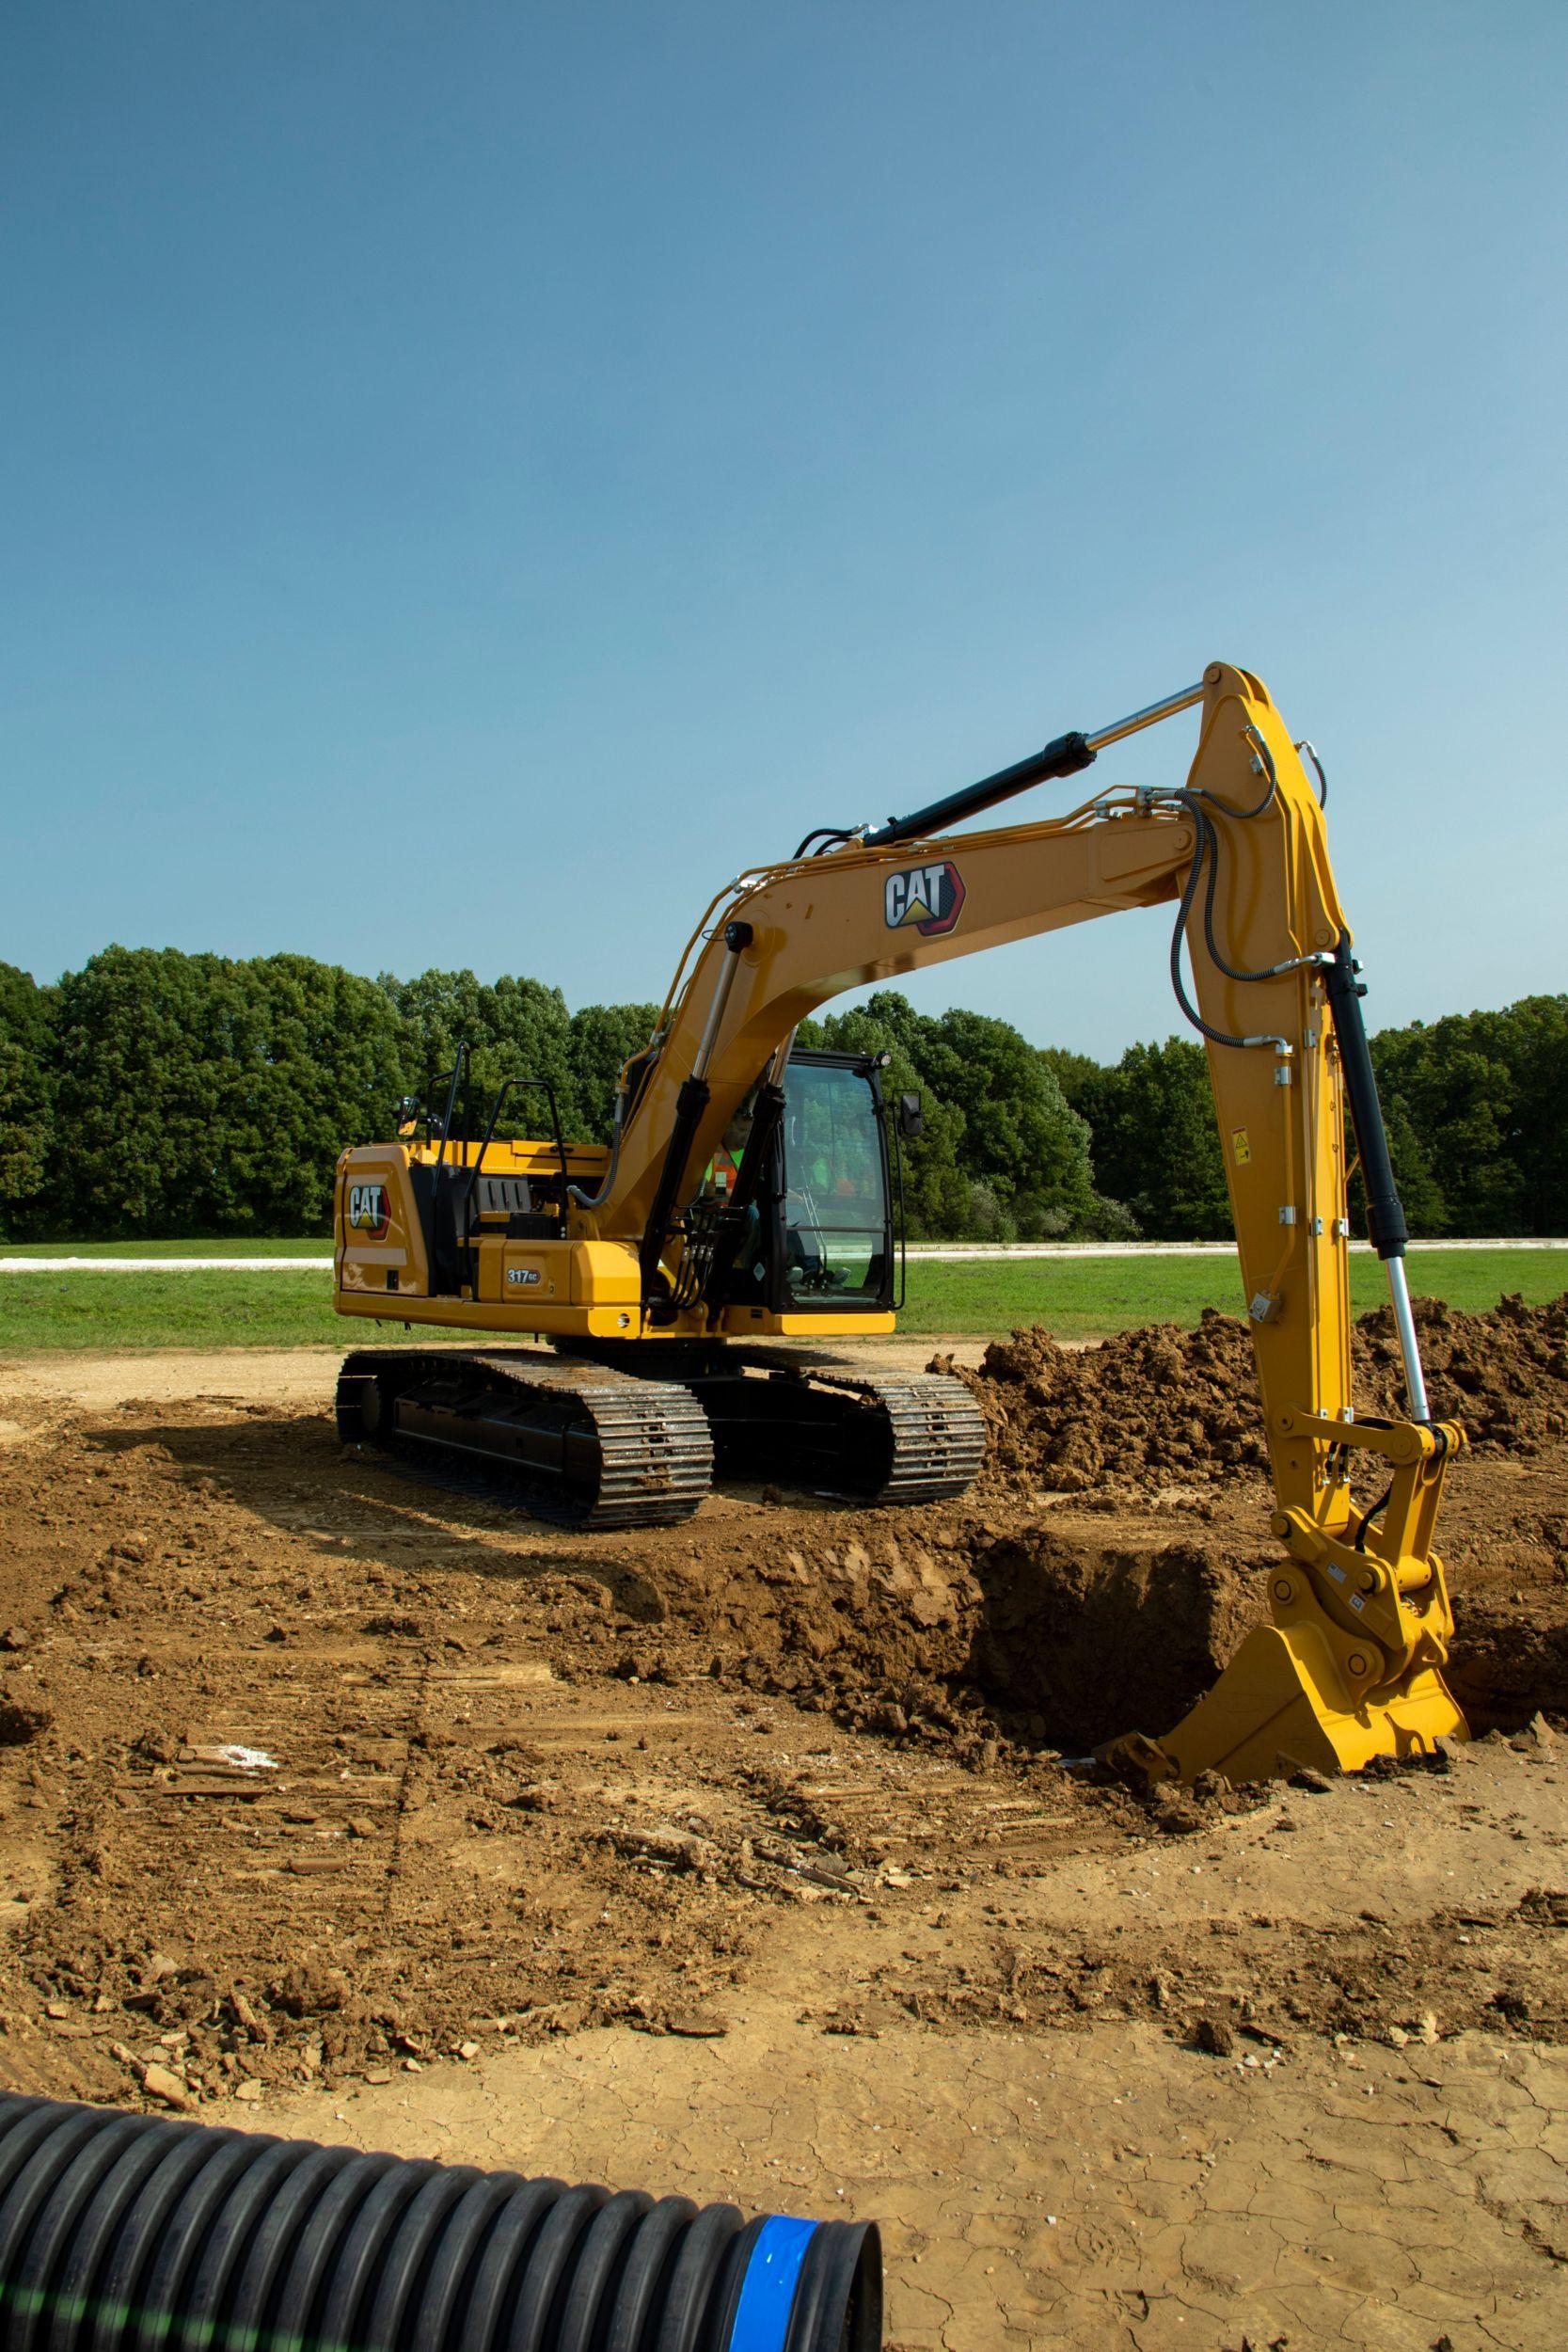 317 GC Digging